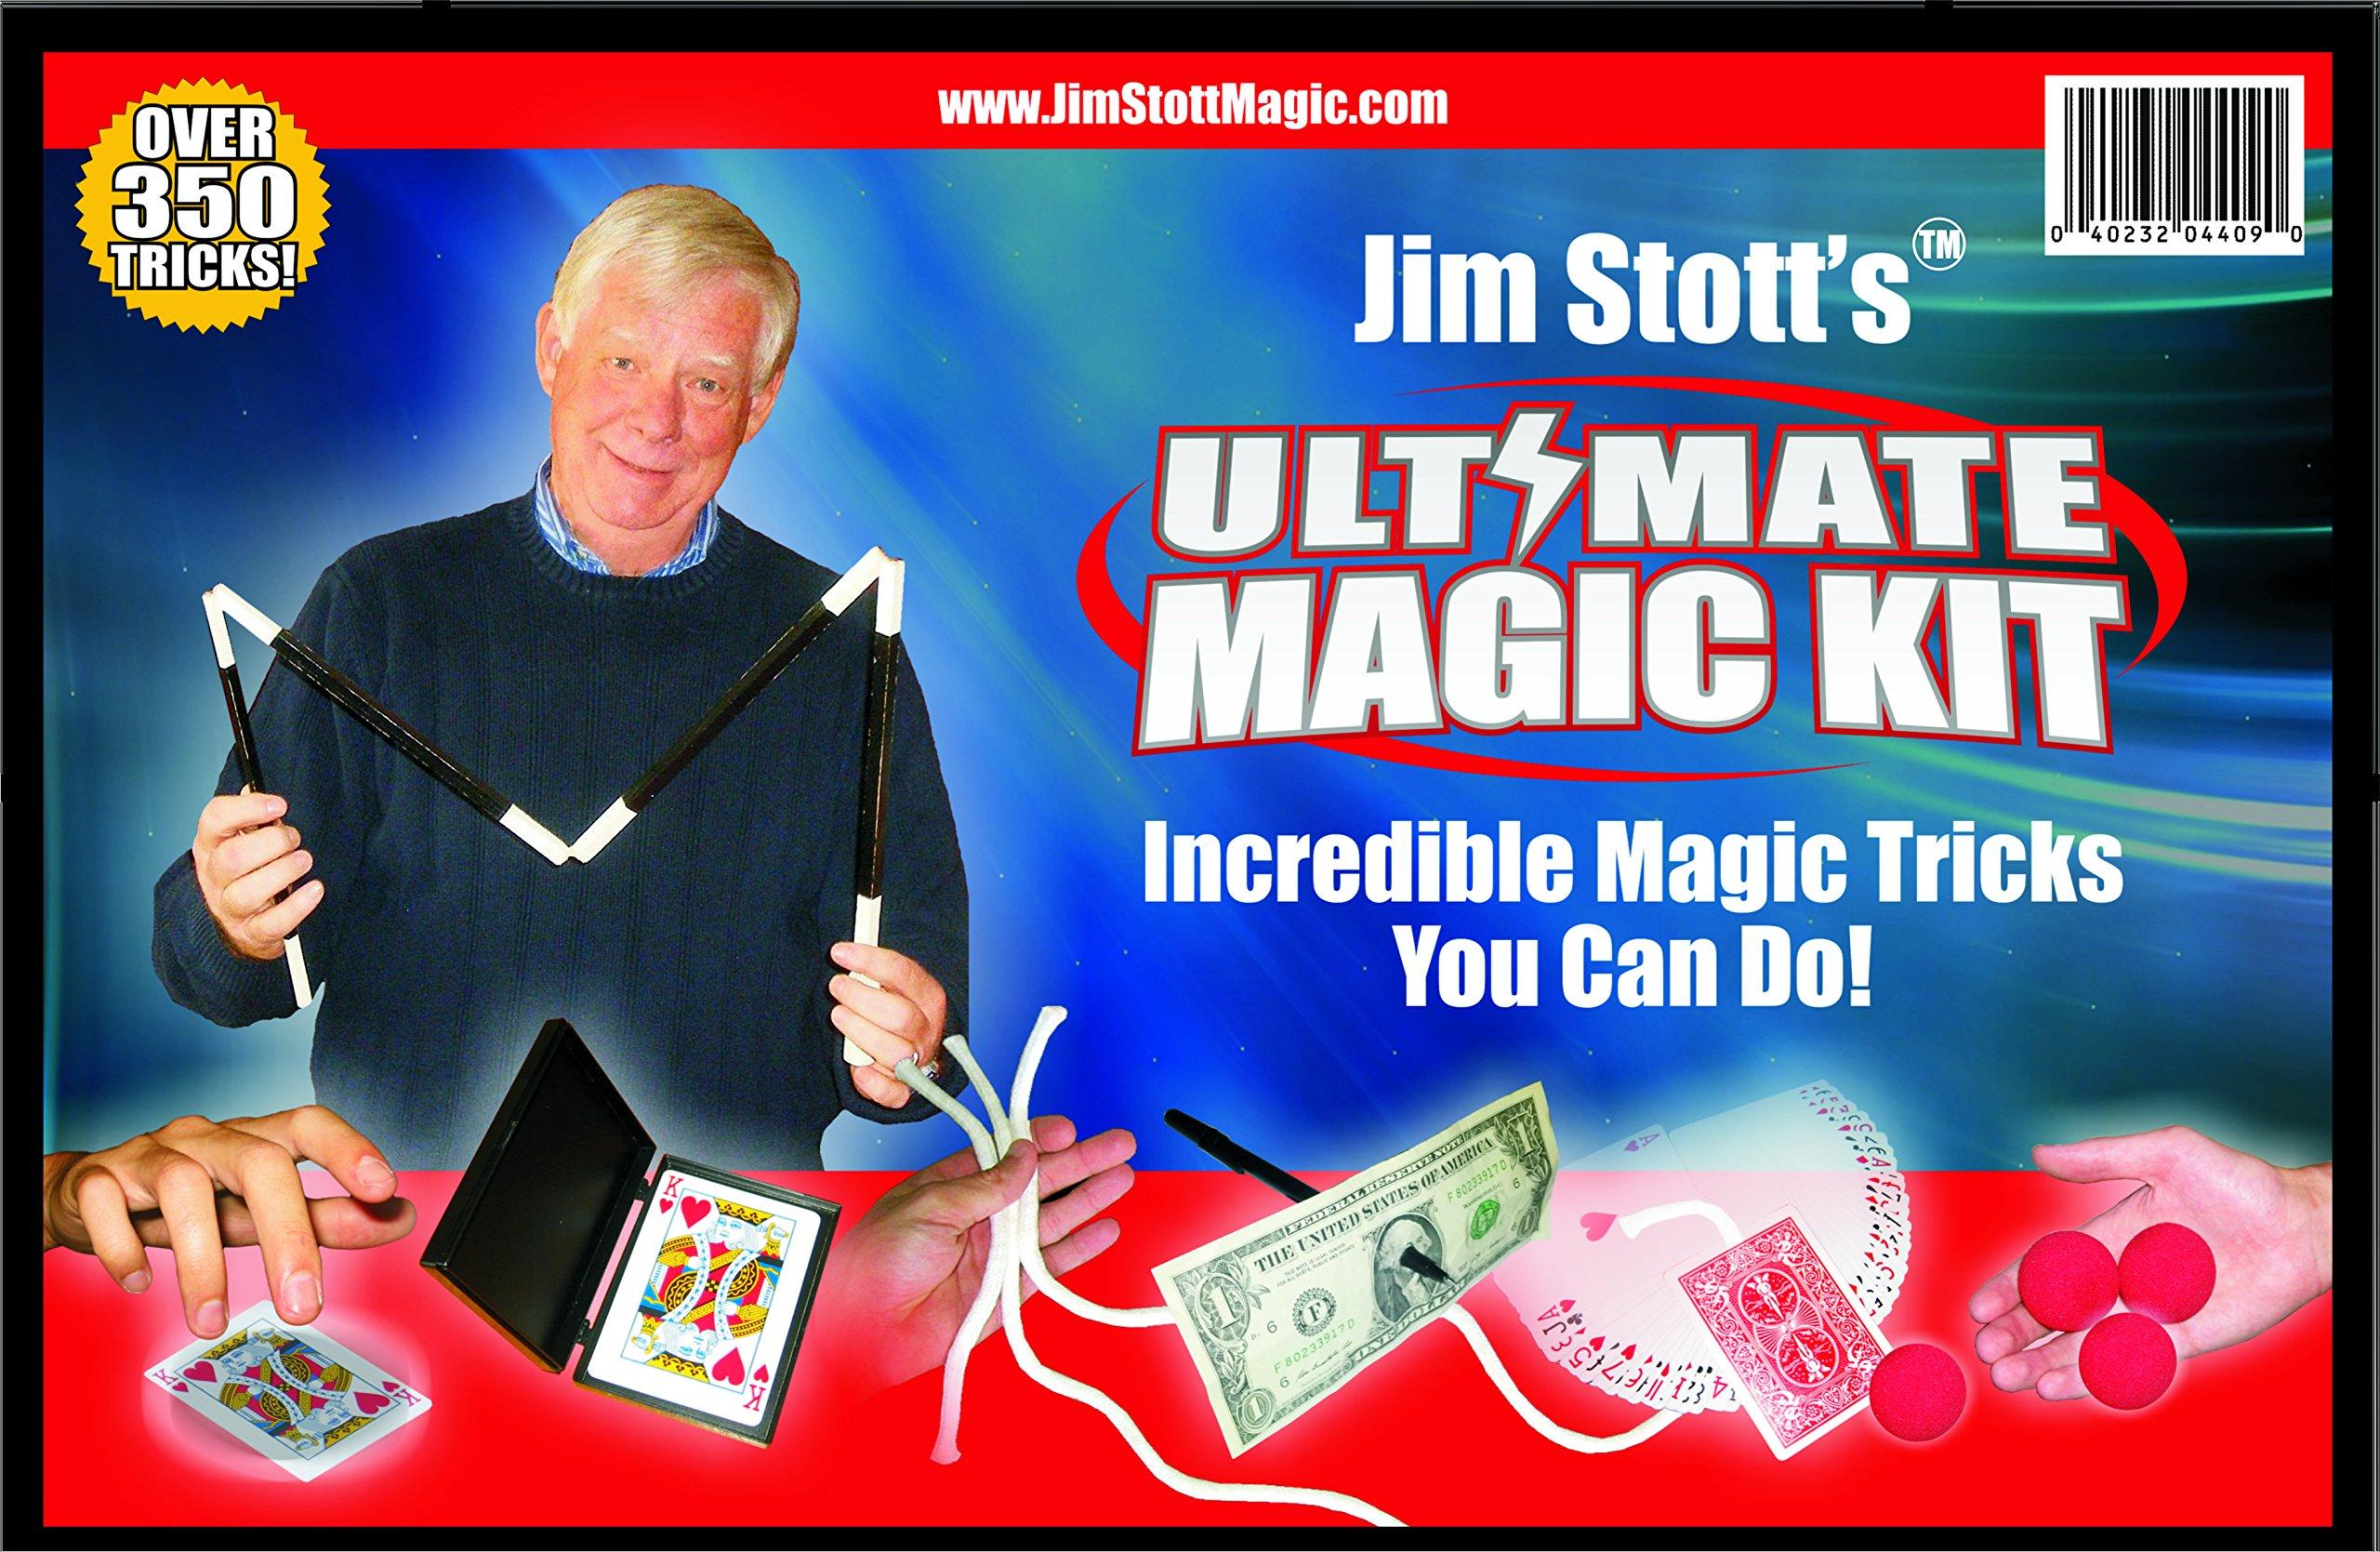 Jim Stott's 'Ultimate Magic Kit, Magic Tricks Set for Adults, Magic Cards Box, Svengali Card Deck, The 3 Rope Mystery, The Incredible Levitation System, Magic Sponge Balls, Magic Pen Penetration